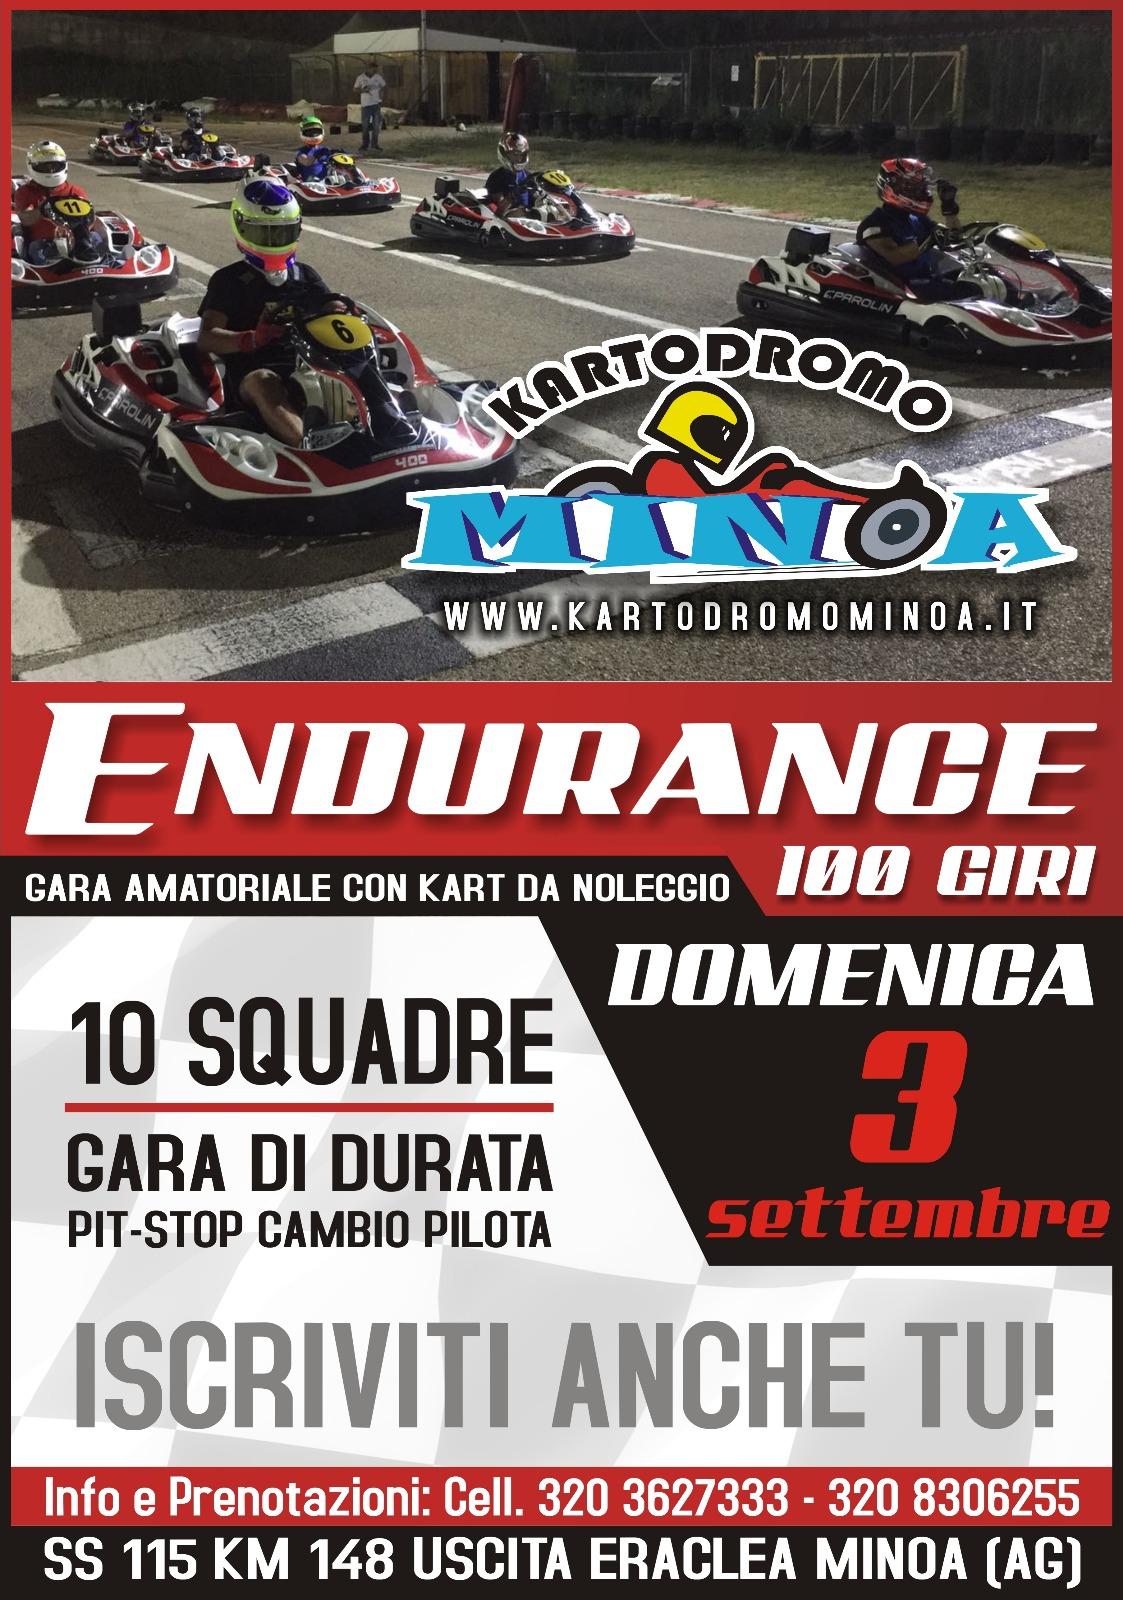 endurance-3-settembre-2017